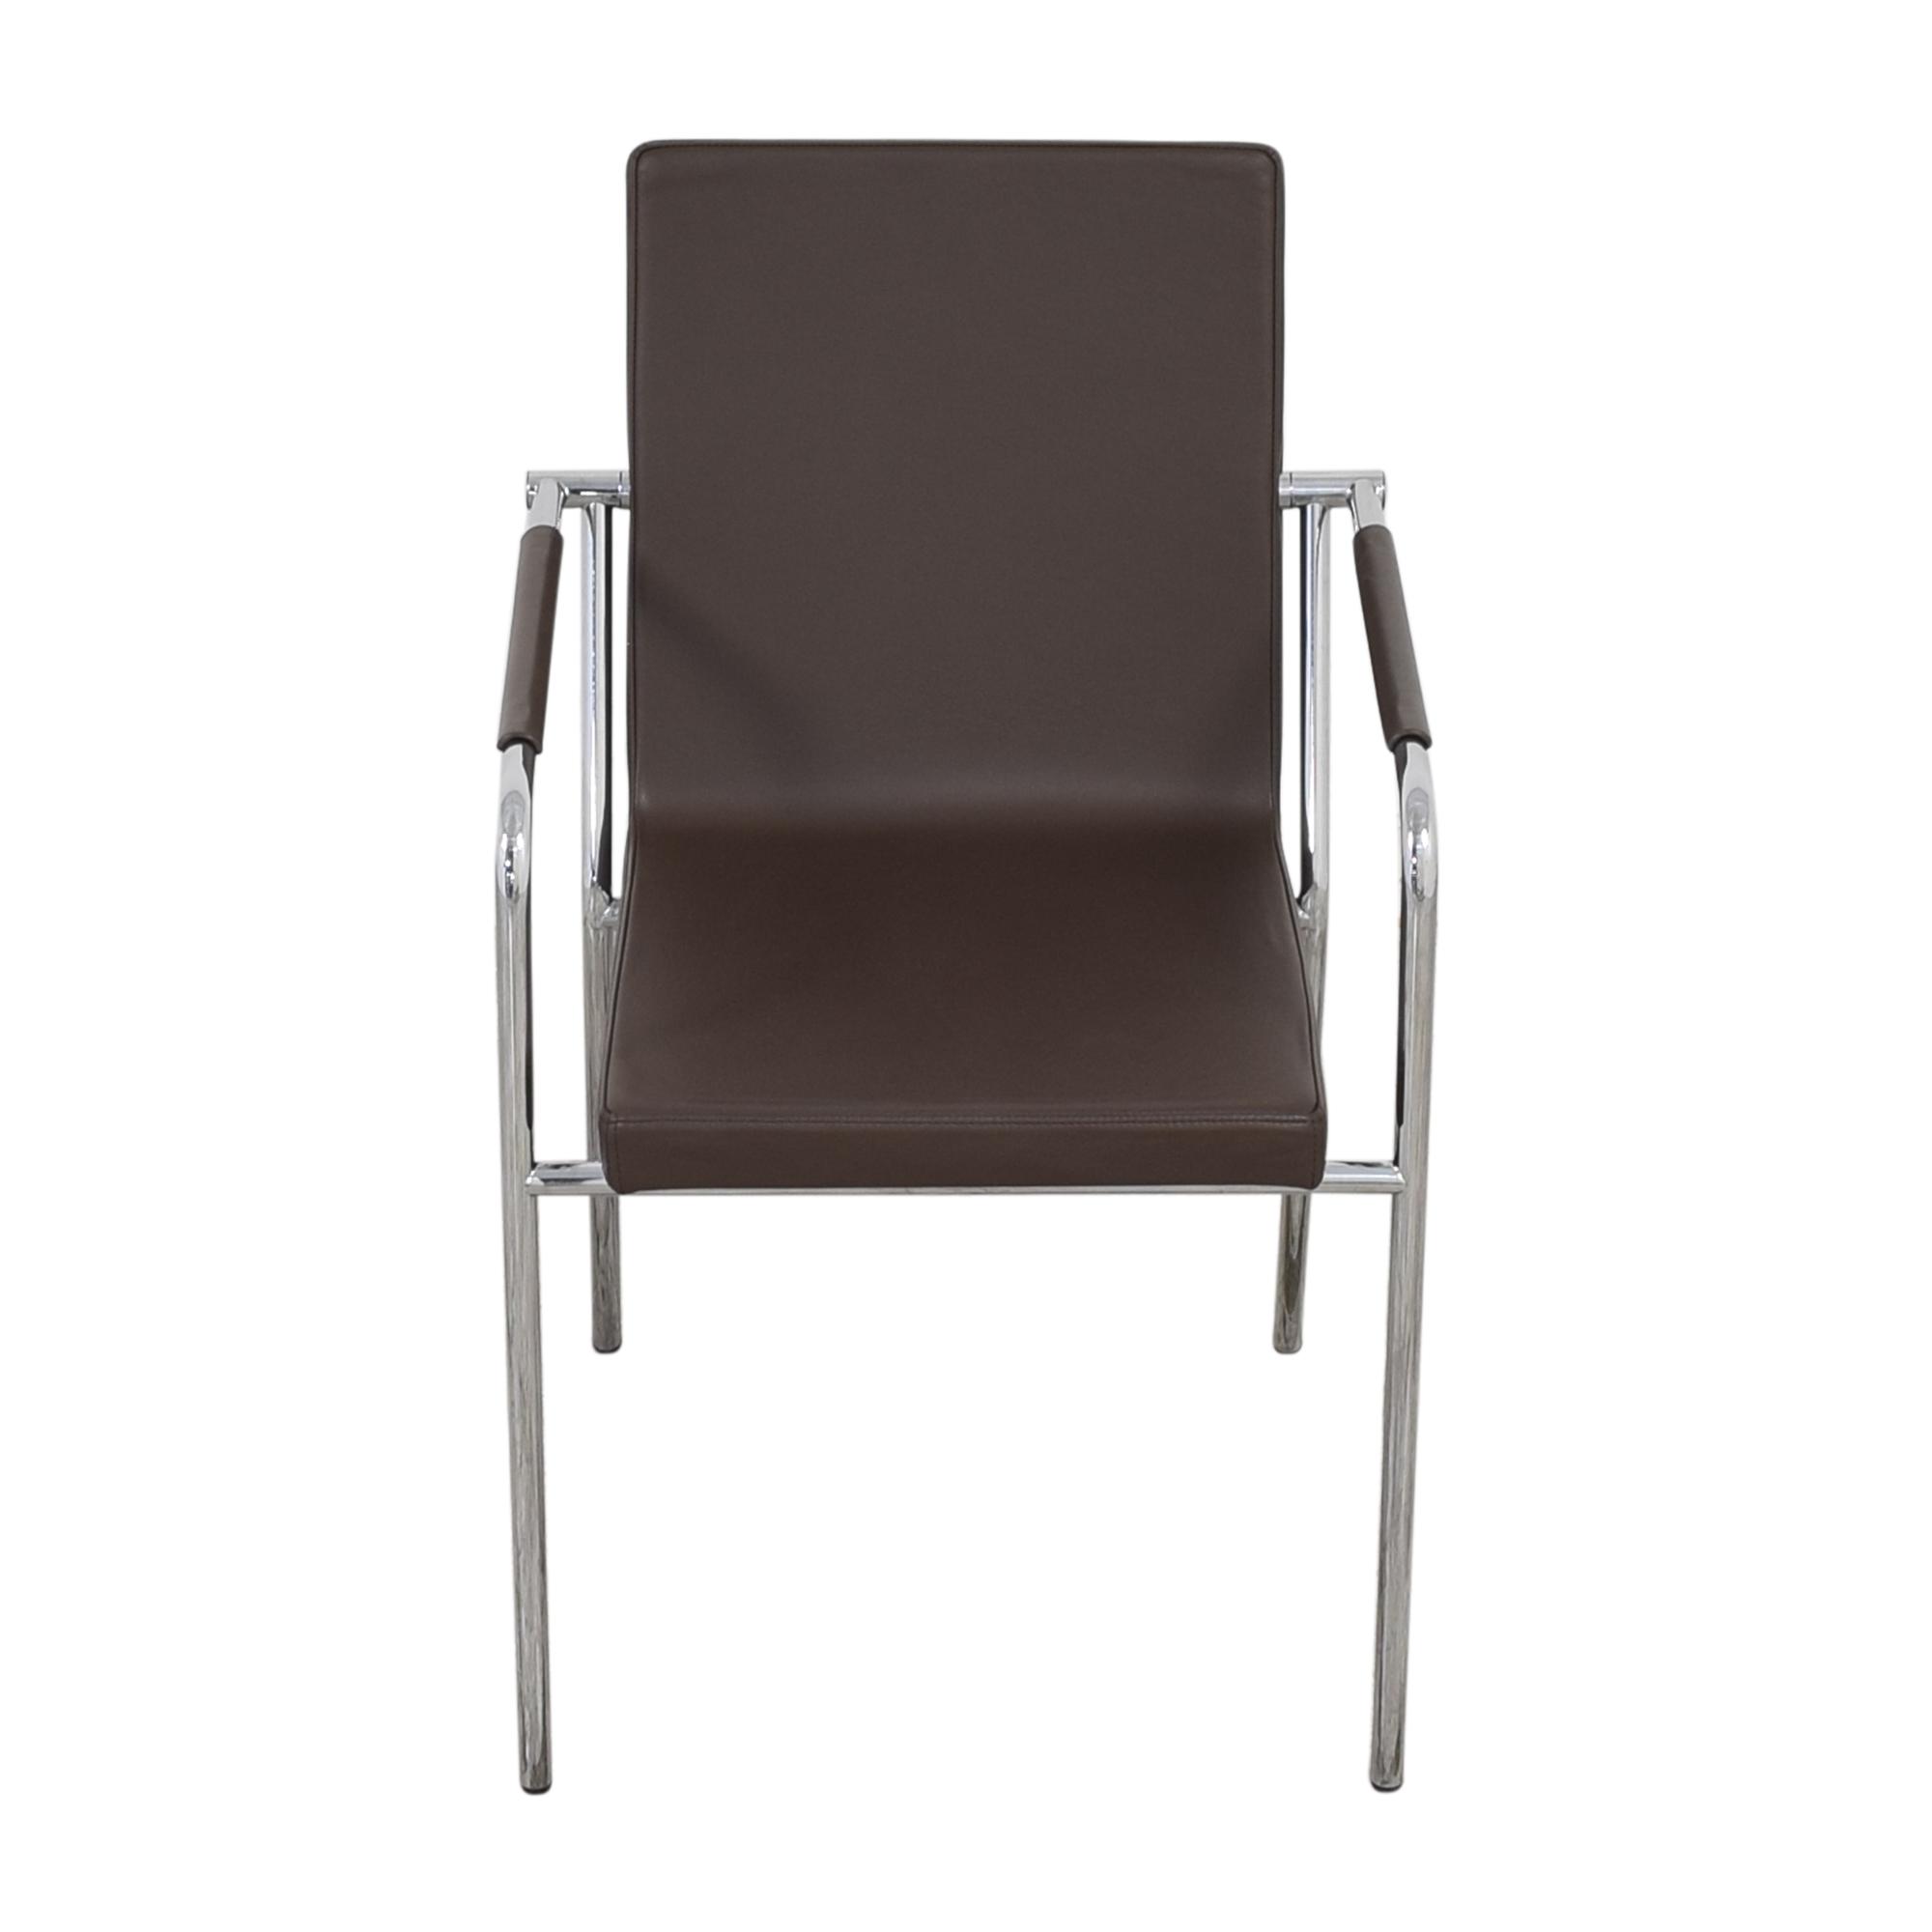 Malik Malik Portsmouth Stackable Armchair on sale